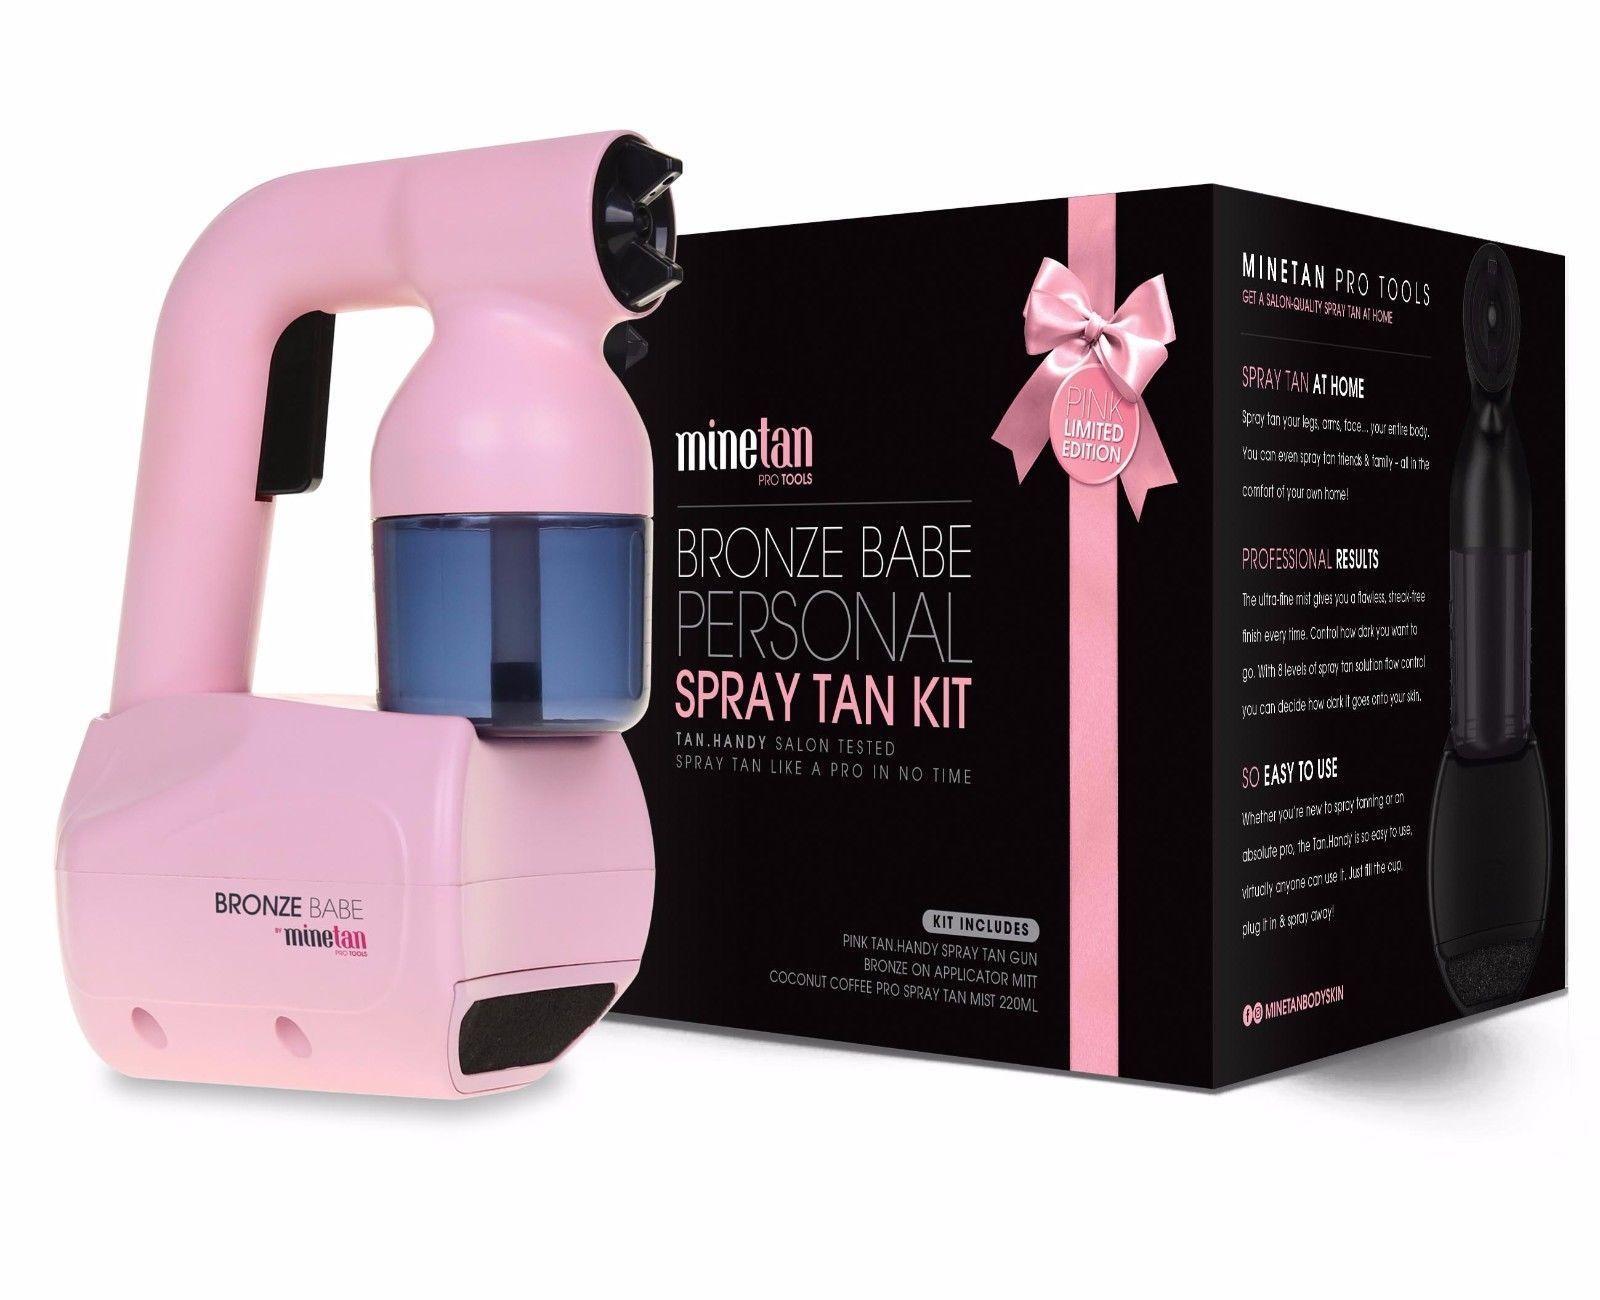 Mine Tan Bronze BABE Personal Spray Tan Kit